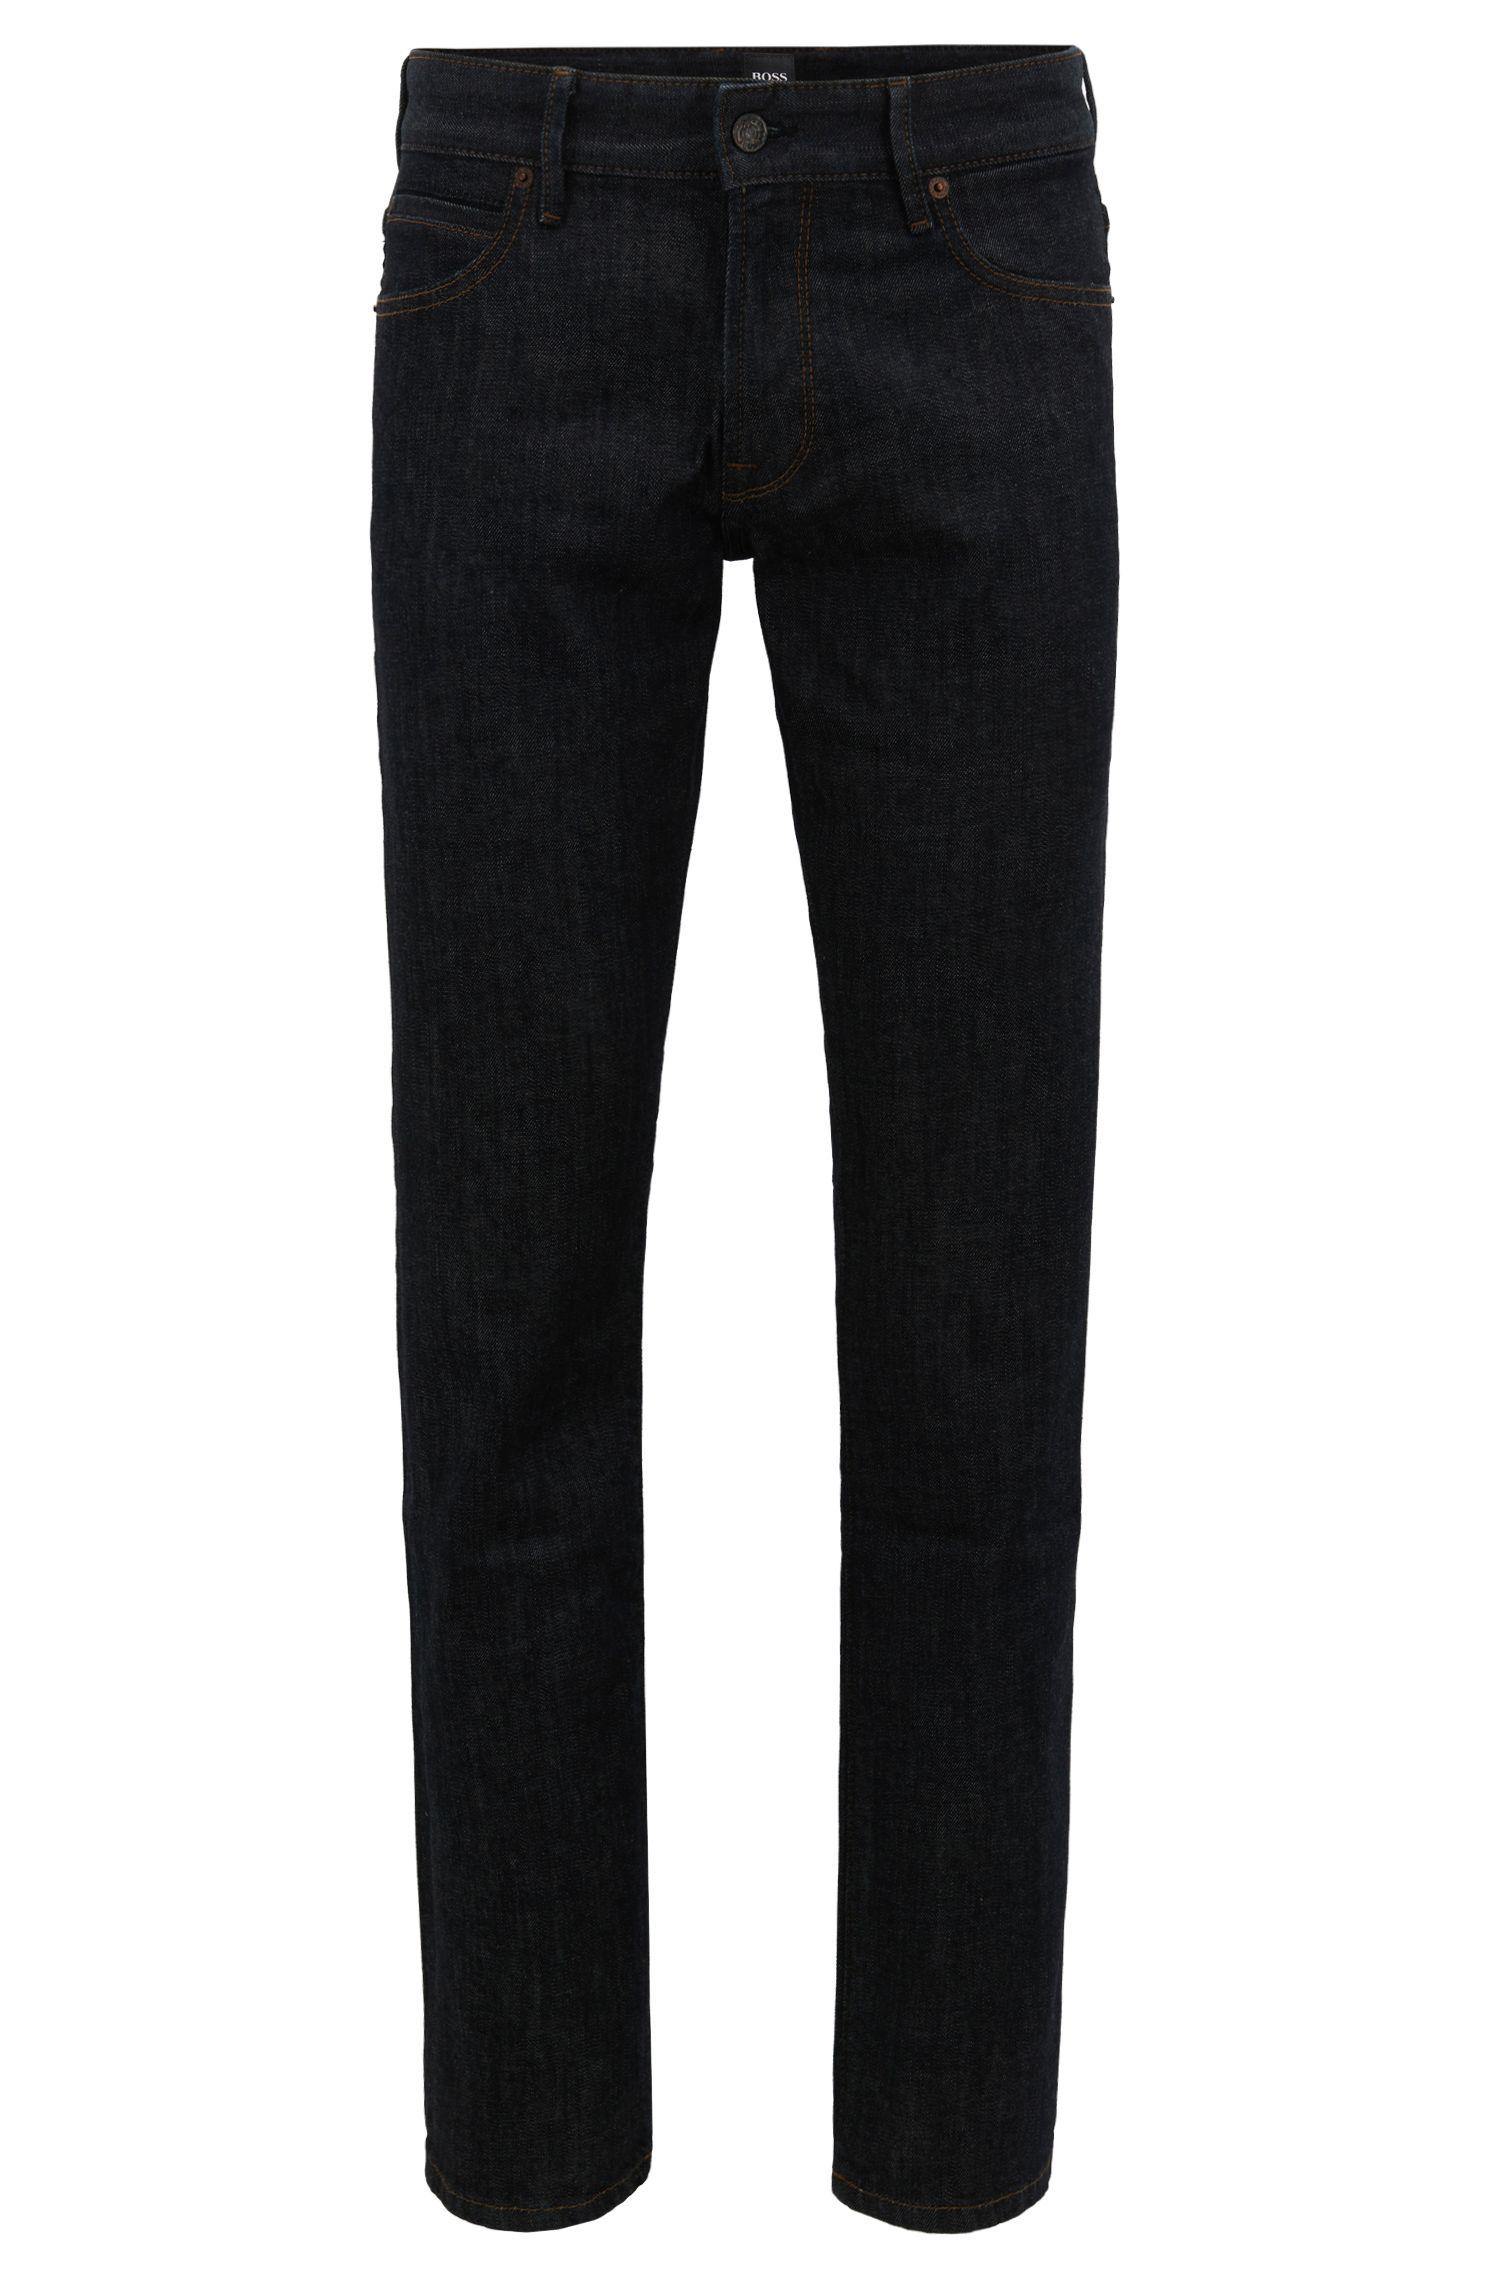 Regular-Fit Jeans aus softem Stone-washed Denim